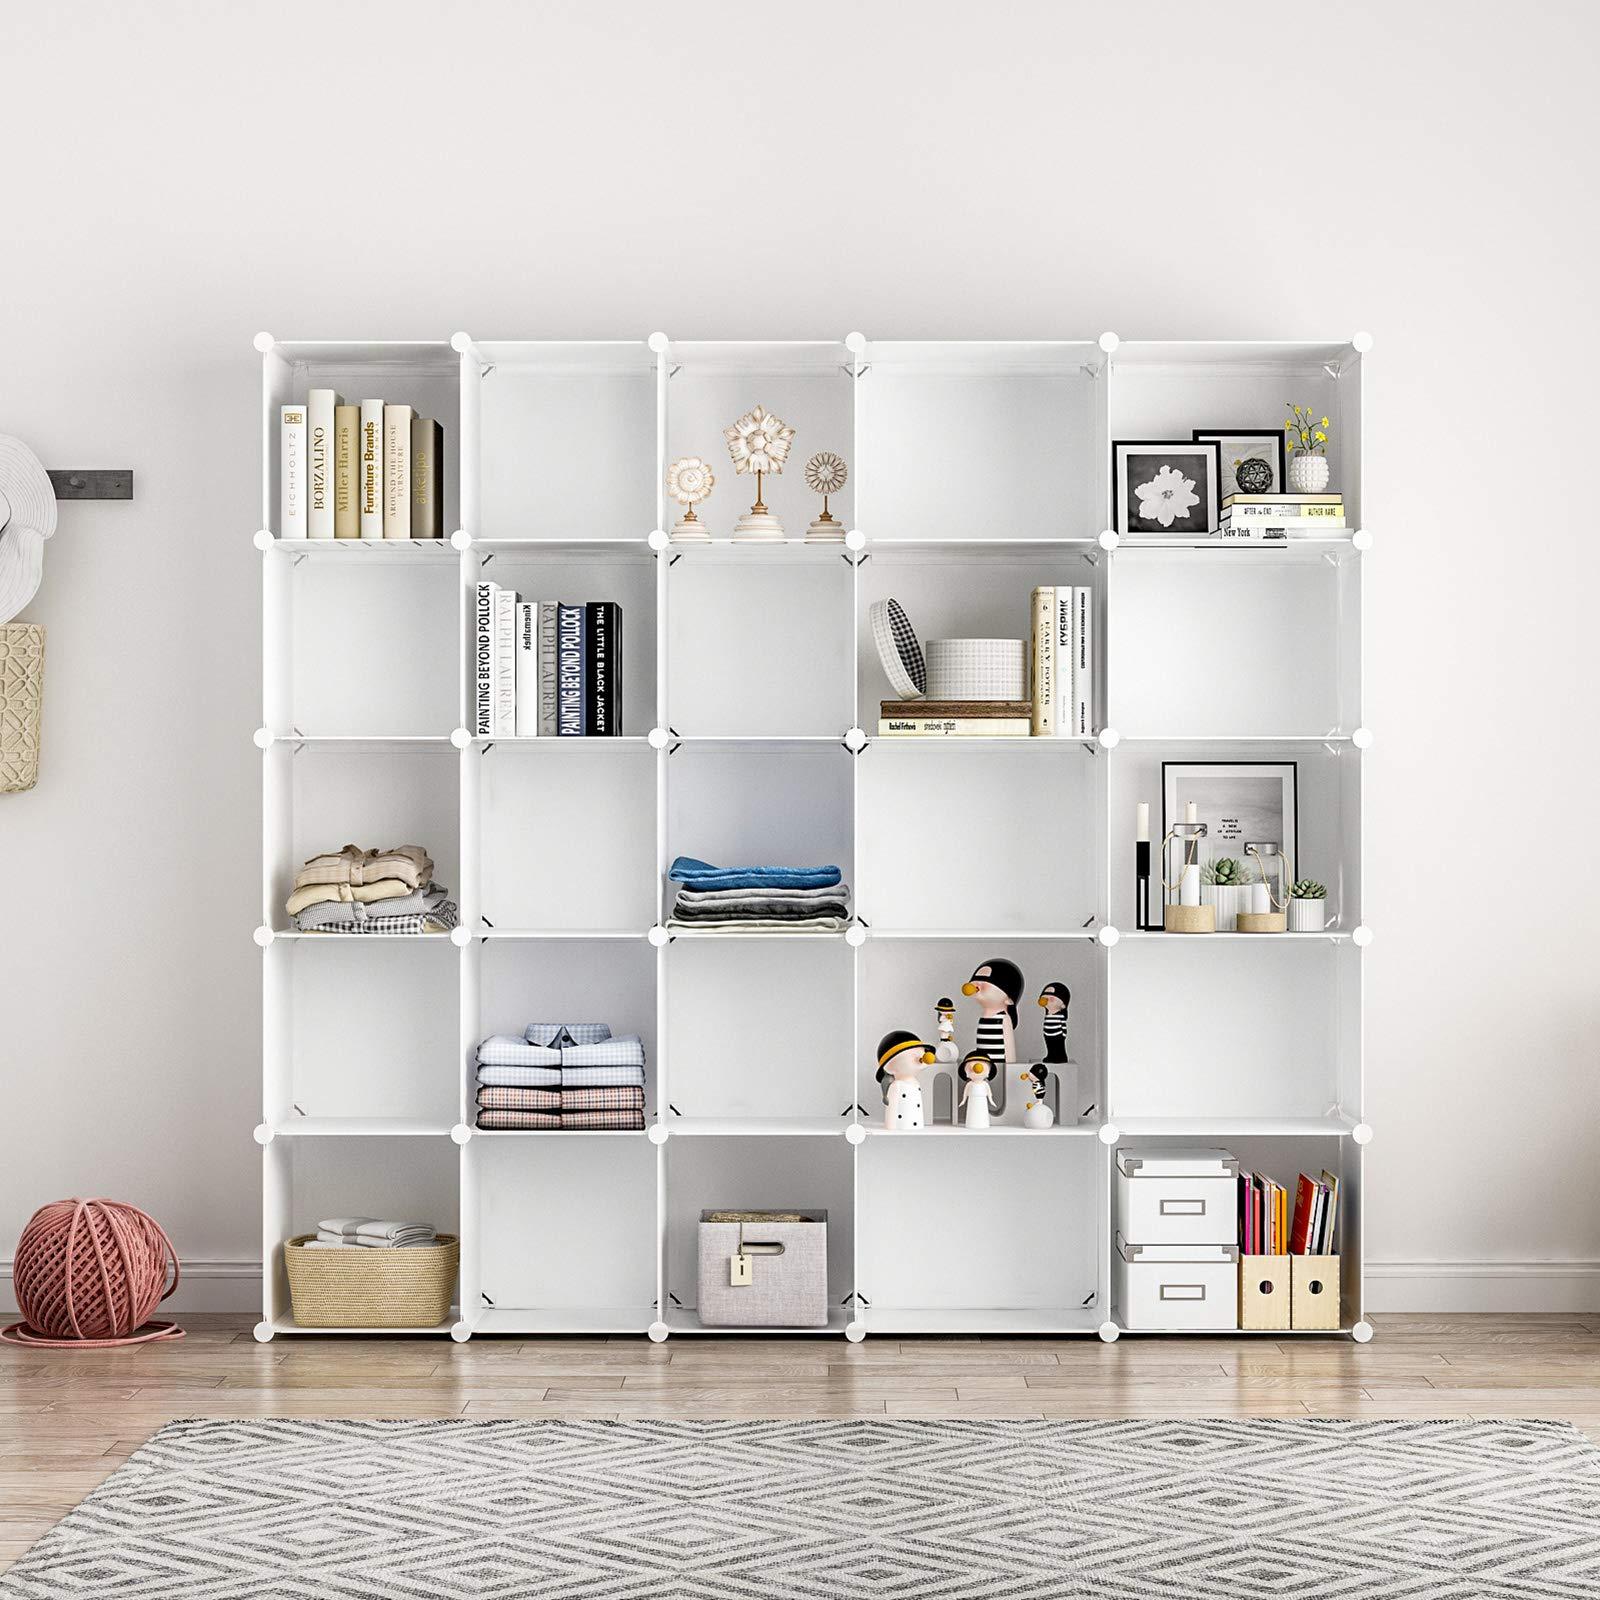 Aeitc 25 Cube Storage Organizer Closet Shelves Storage Cubes DIY Cubby Organizing Modular Cabinet Bookcase Cubby Closet Shelf for Bedroom, Living Room, White